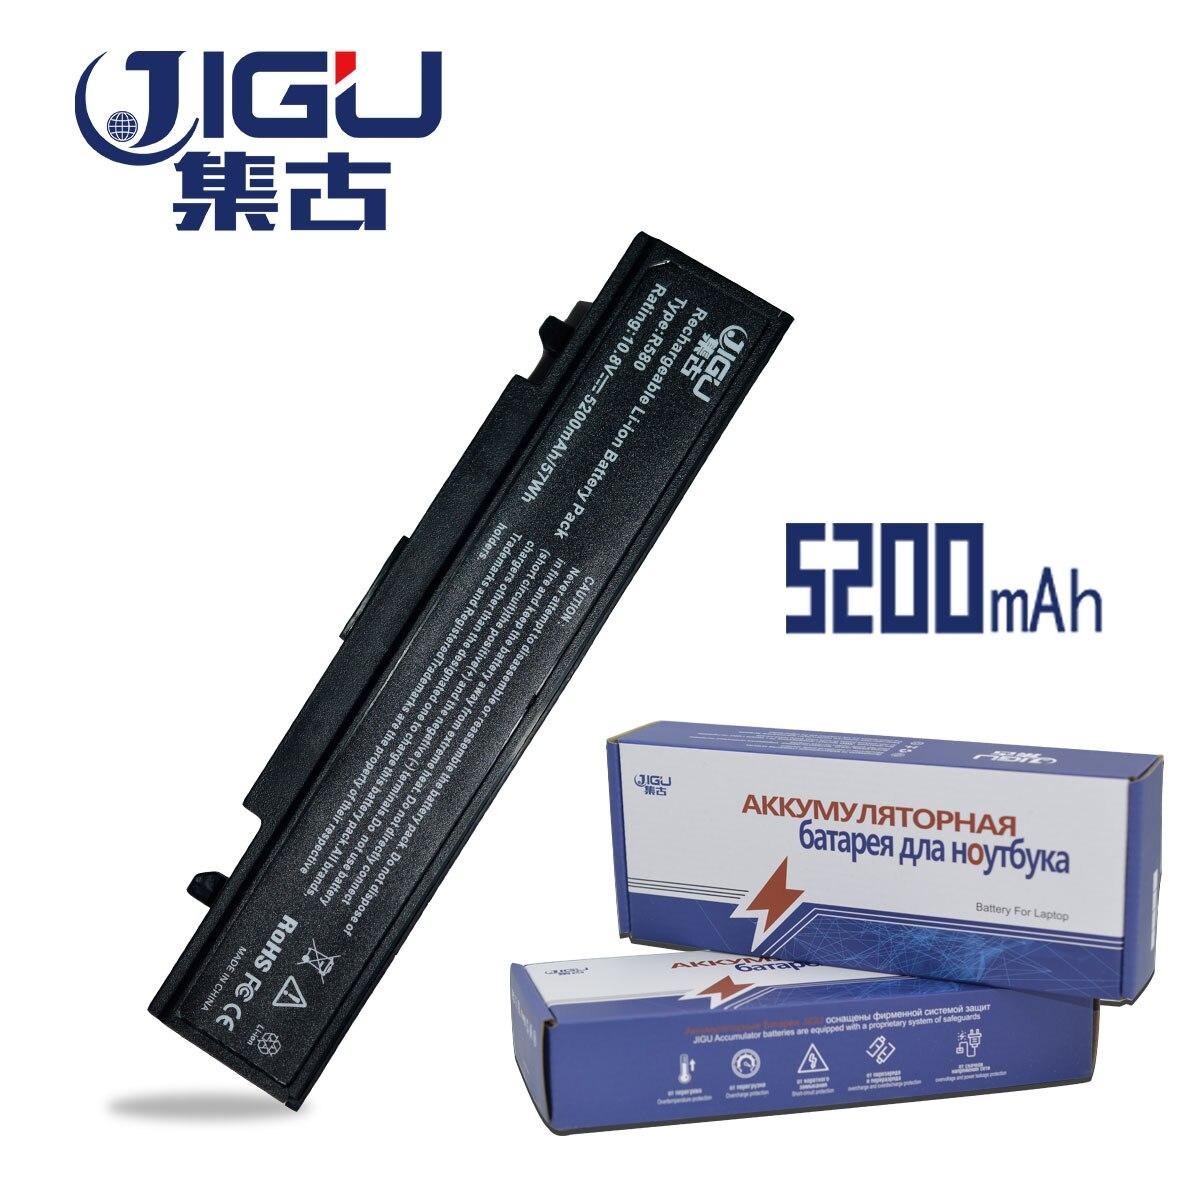 Batería del ordenador portátil de JIGU para Samsung AA-PB9NS6B PB9NC6B R580 R540 R519 R525 R430 R530 RV511 RV411 RV508 R510 R528 Aa Pb9ns6b 6 células